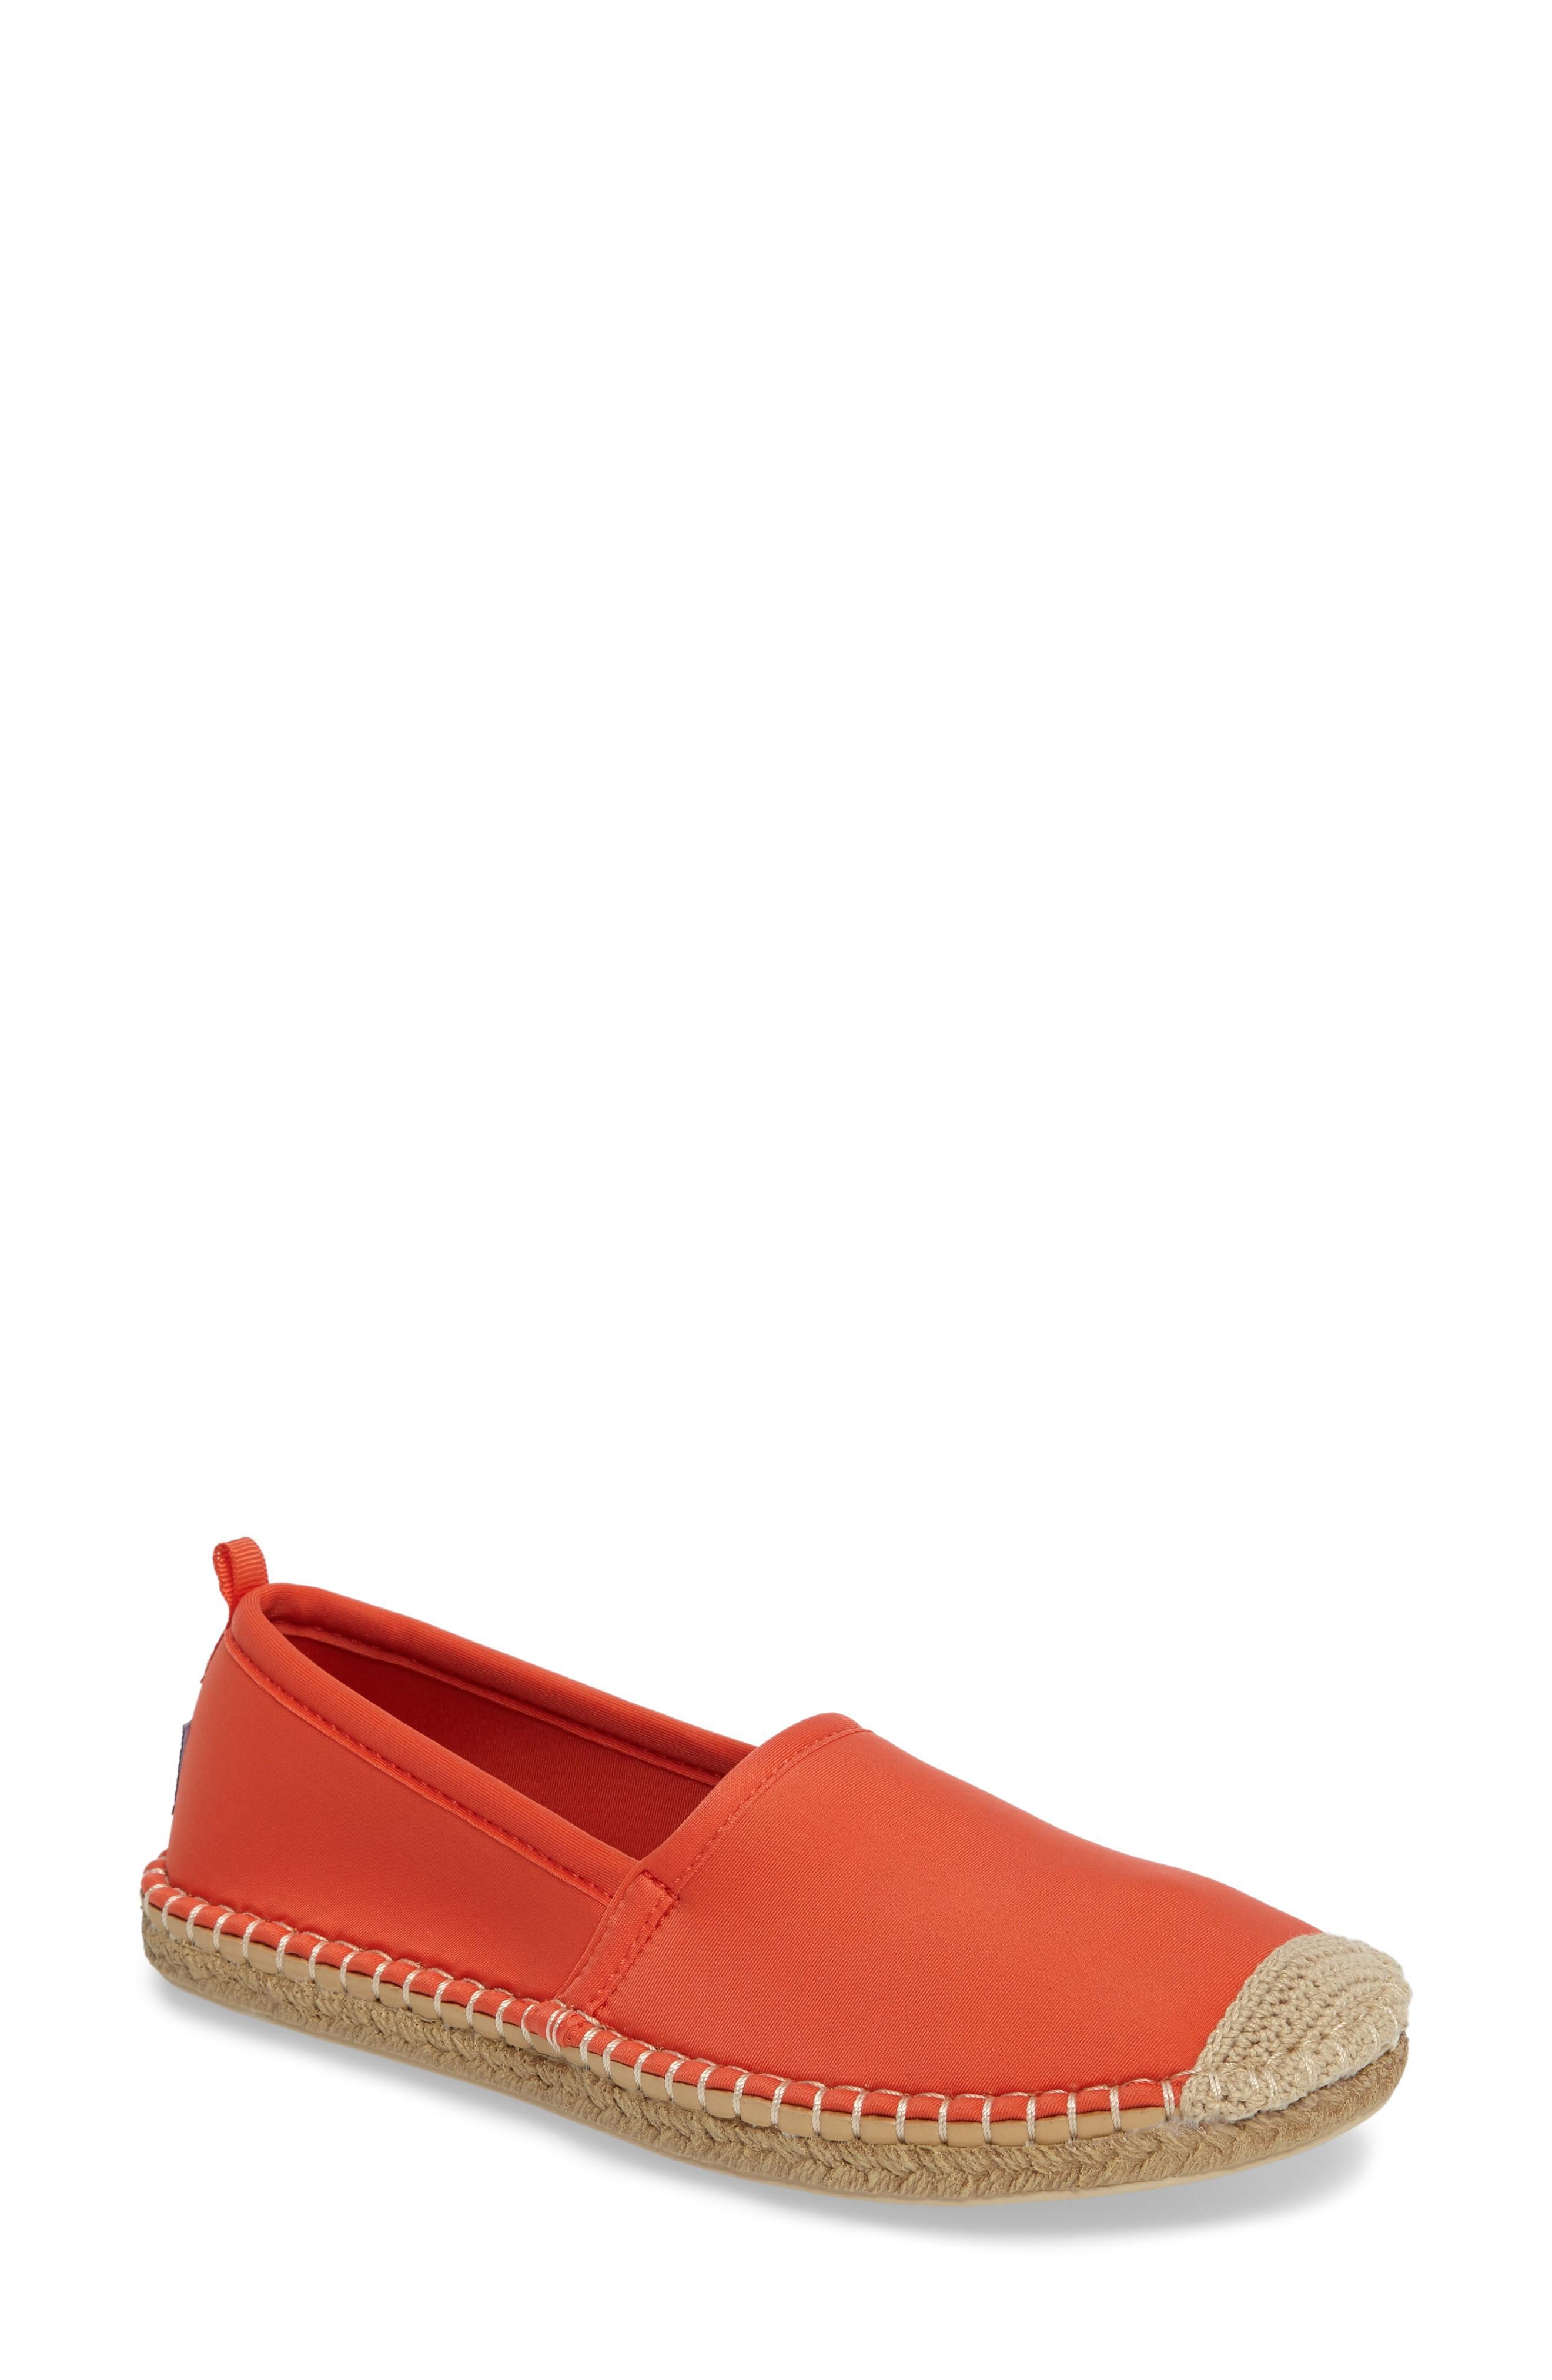 9358e3dde807 Sea Star Beachwear Beachcomber Espadrille Water Shoe In Sea Star Orange  Fabric